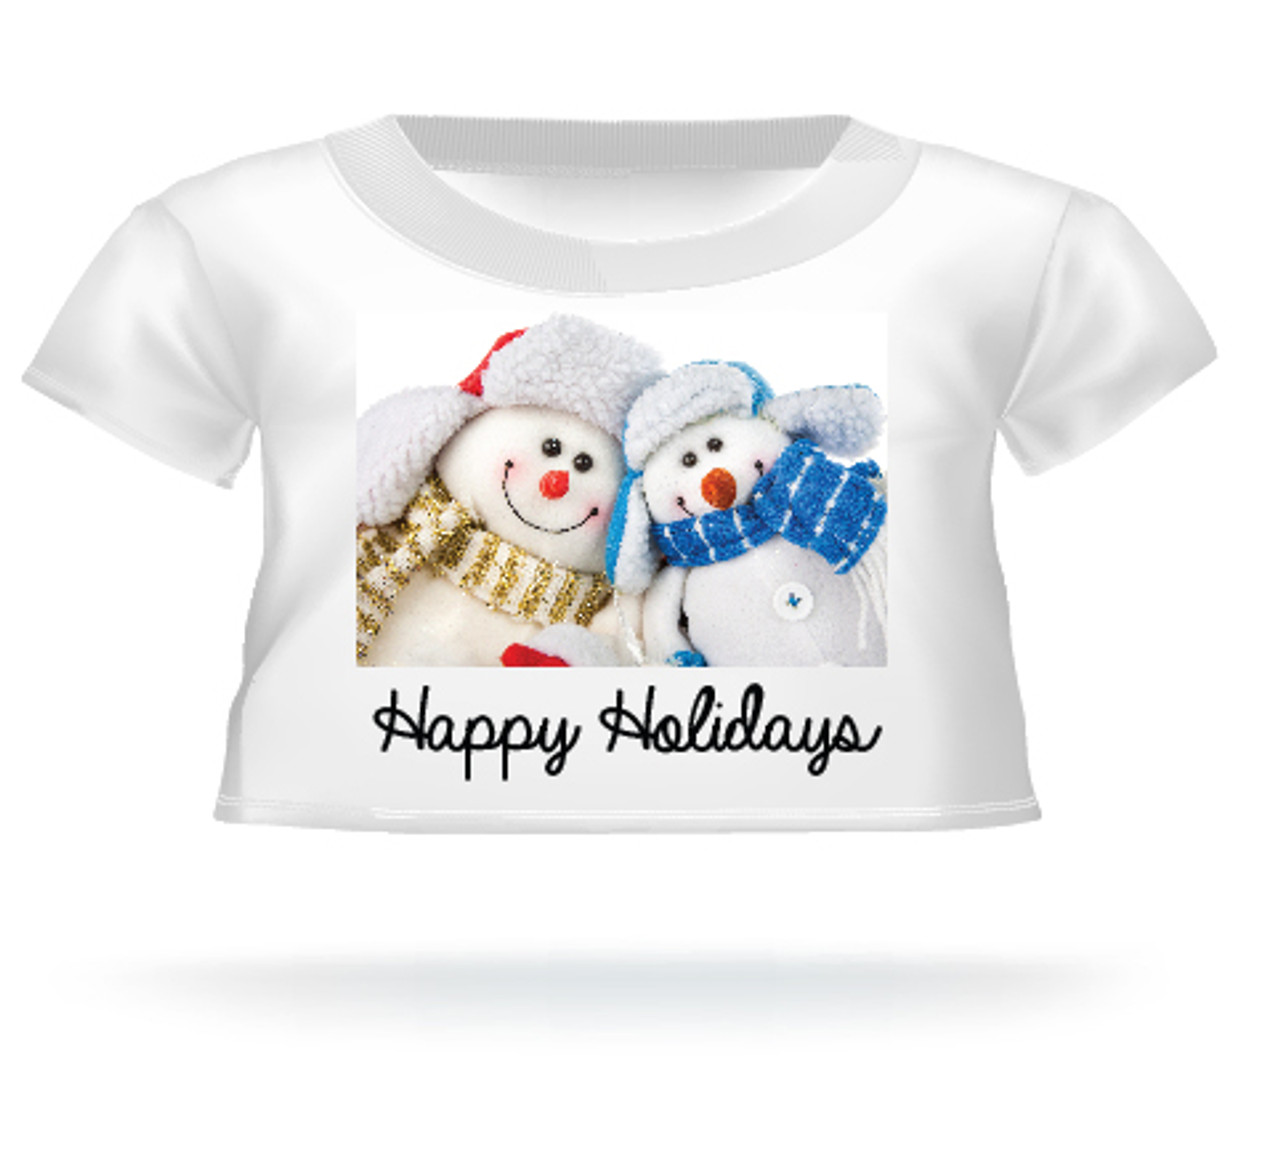 Happy Holidays Teddy Bear T-shirt